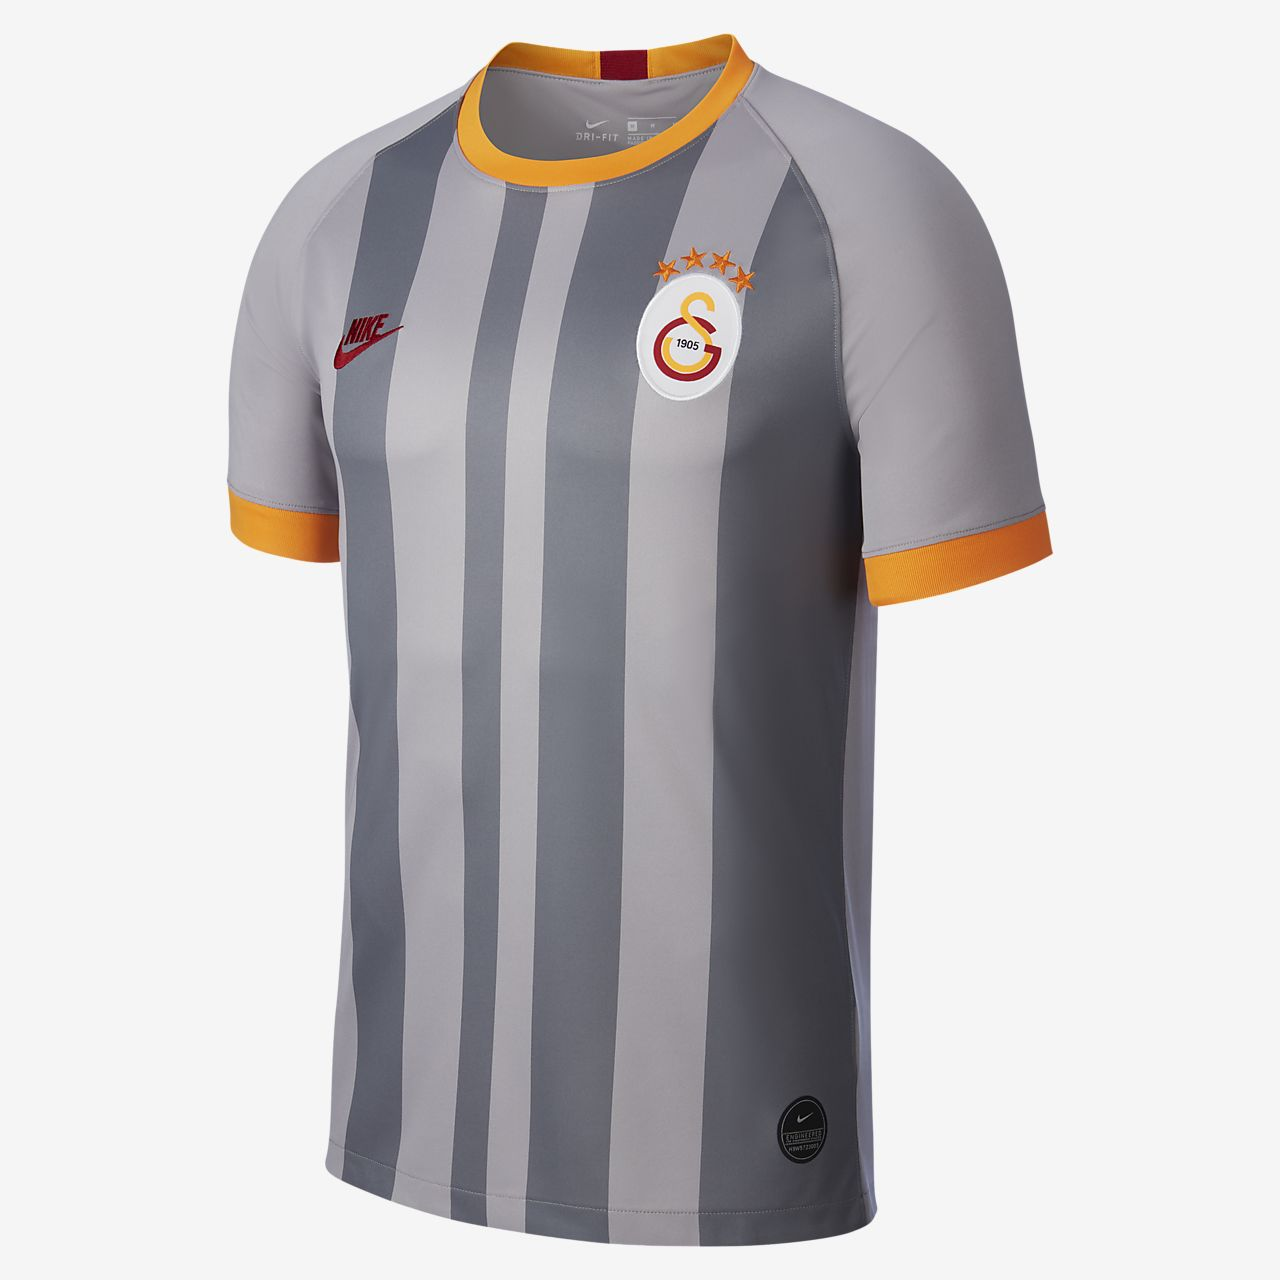 Galatasaray 2019/20 Stadium Third Camiseta de fútbol - Hombre